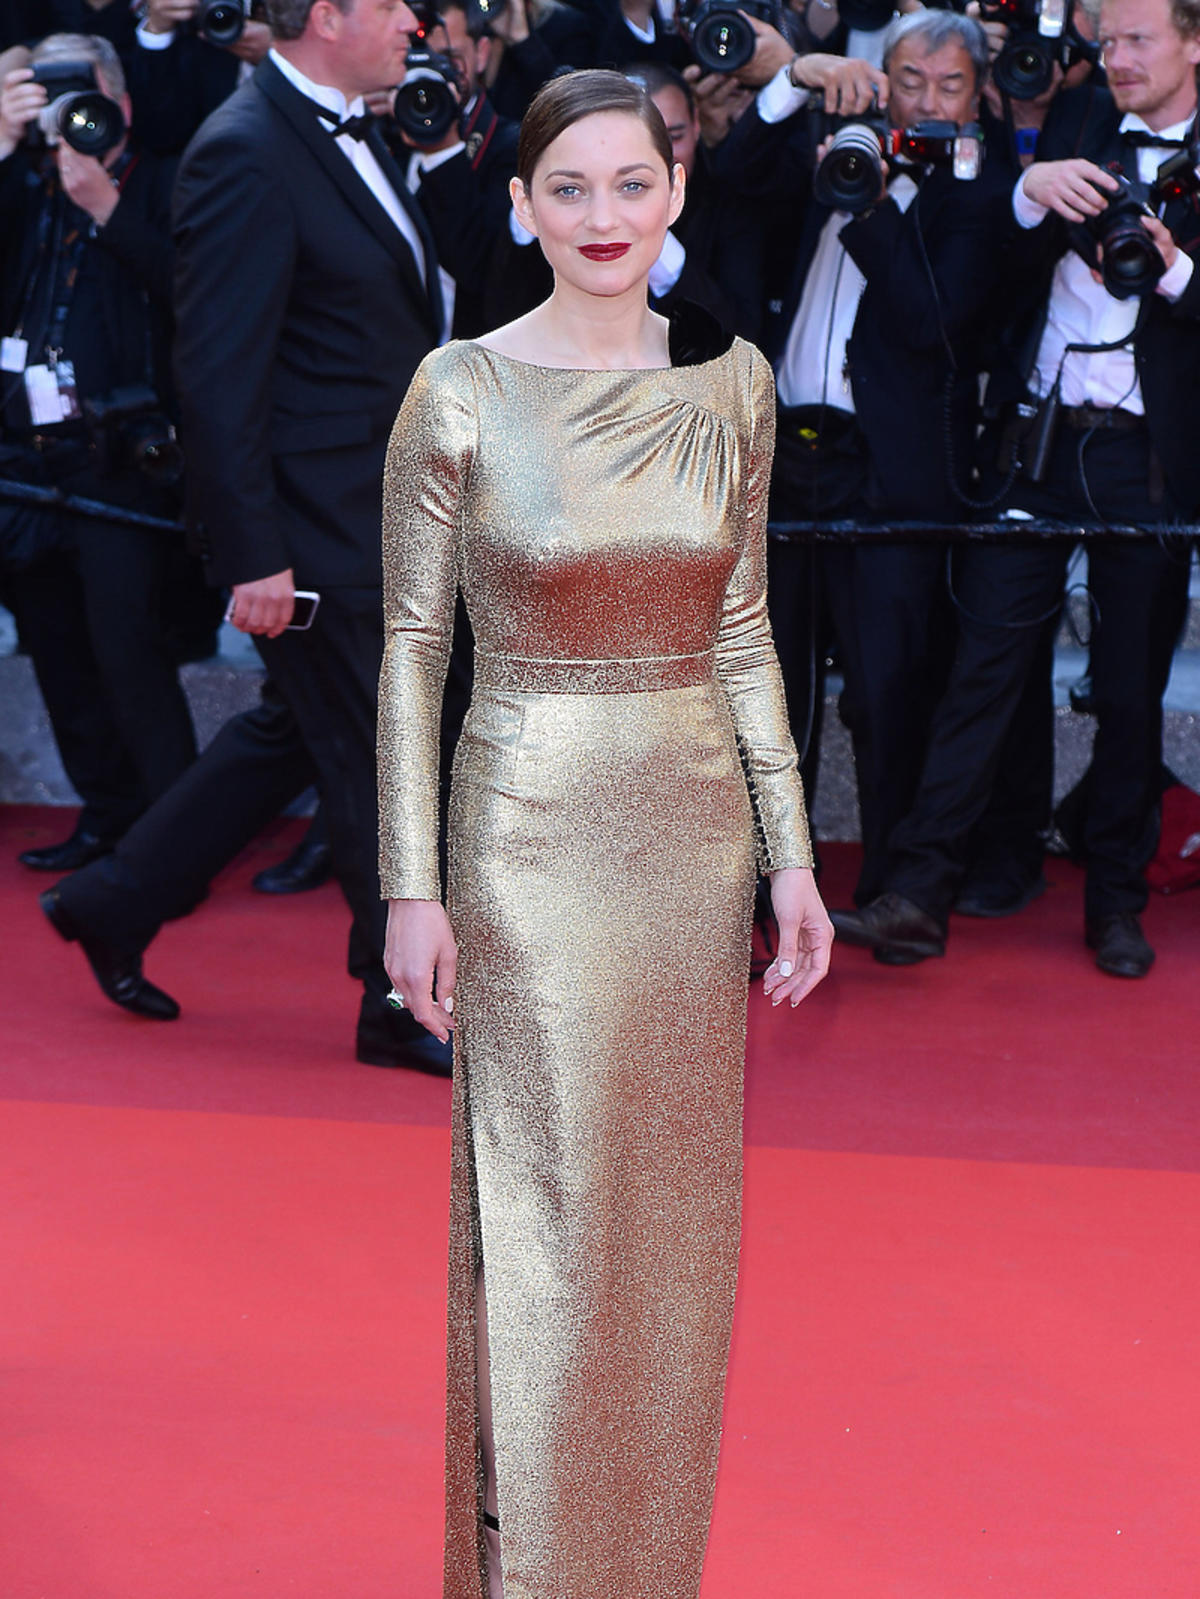 Marion Cotillard w złotej sukience